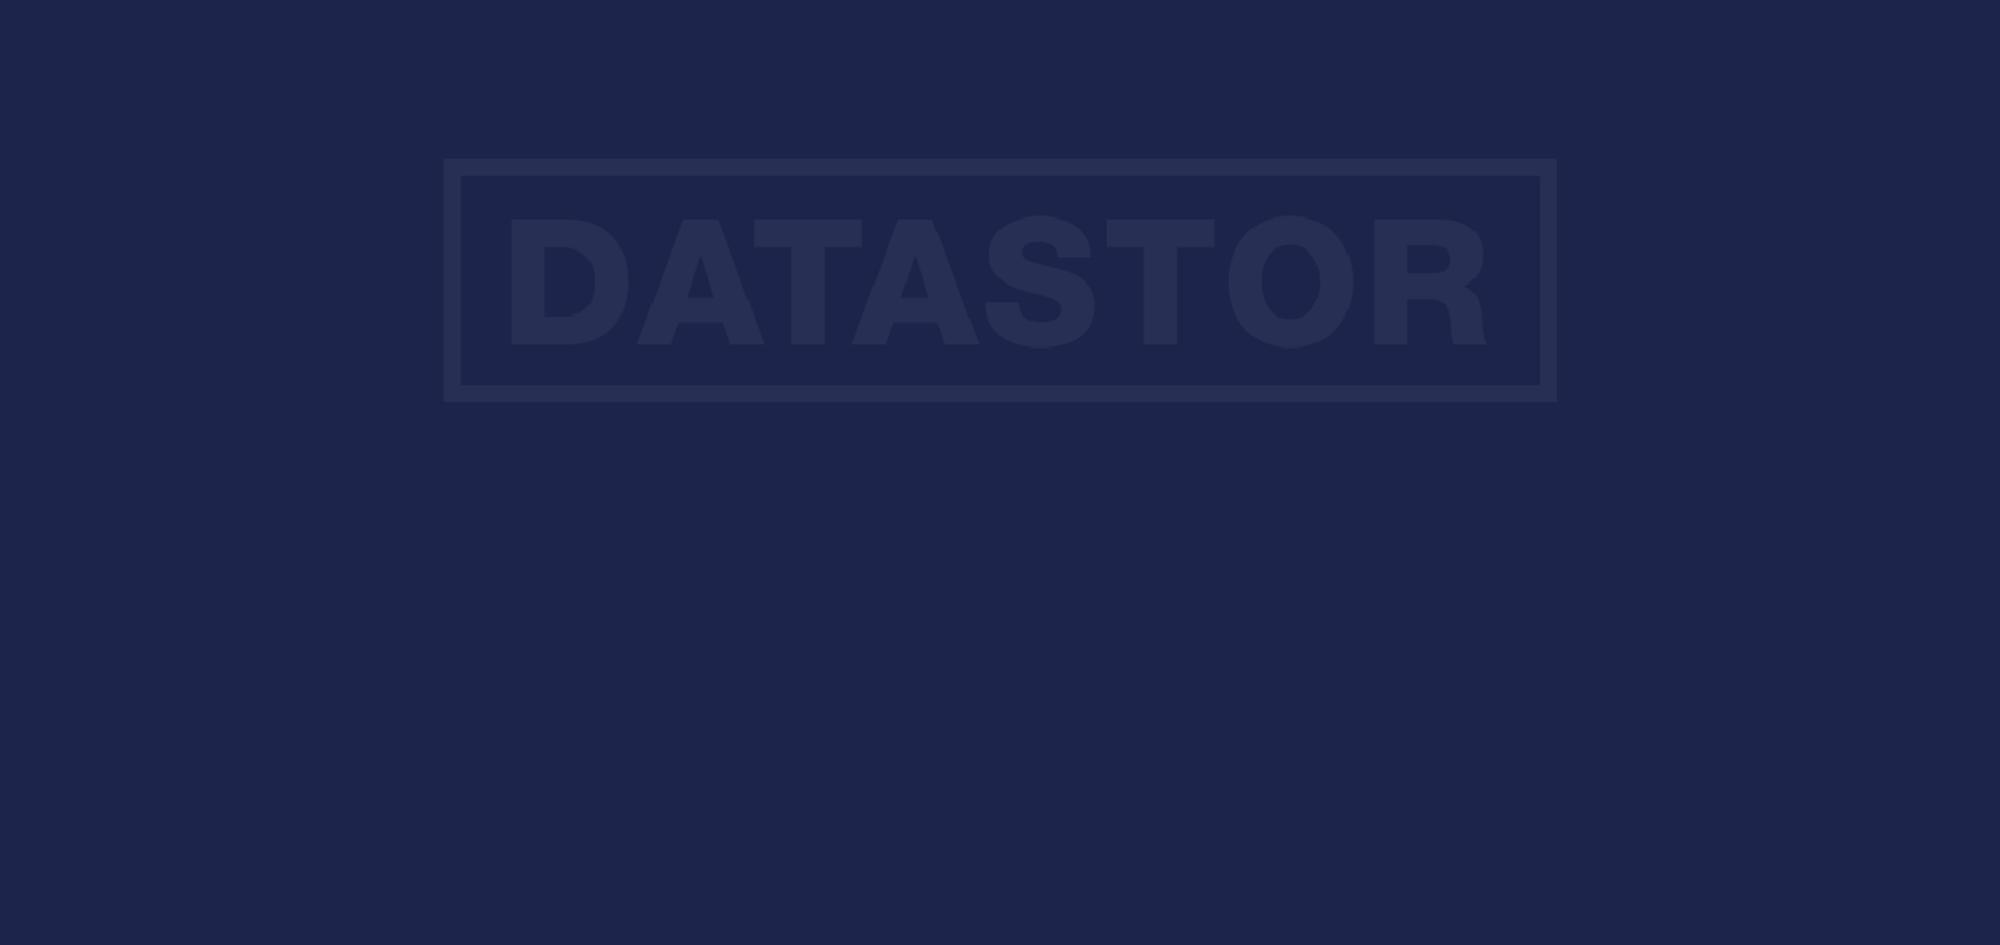 Datastor background Image